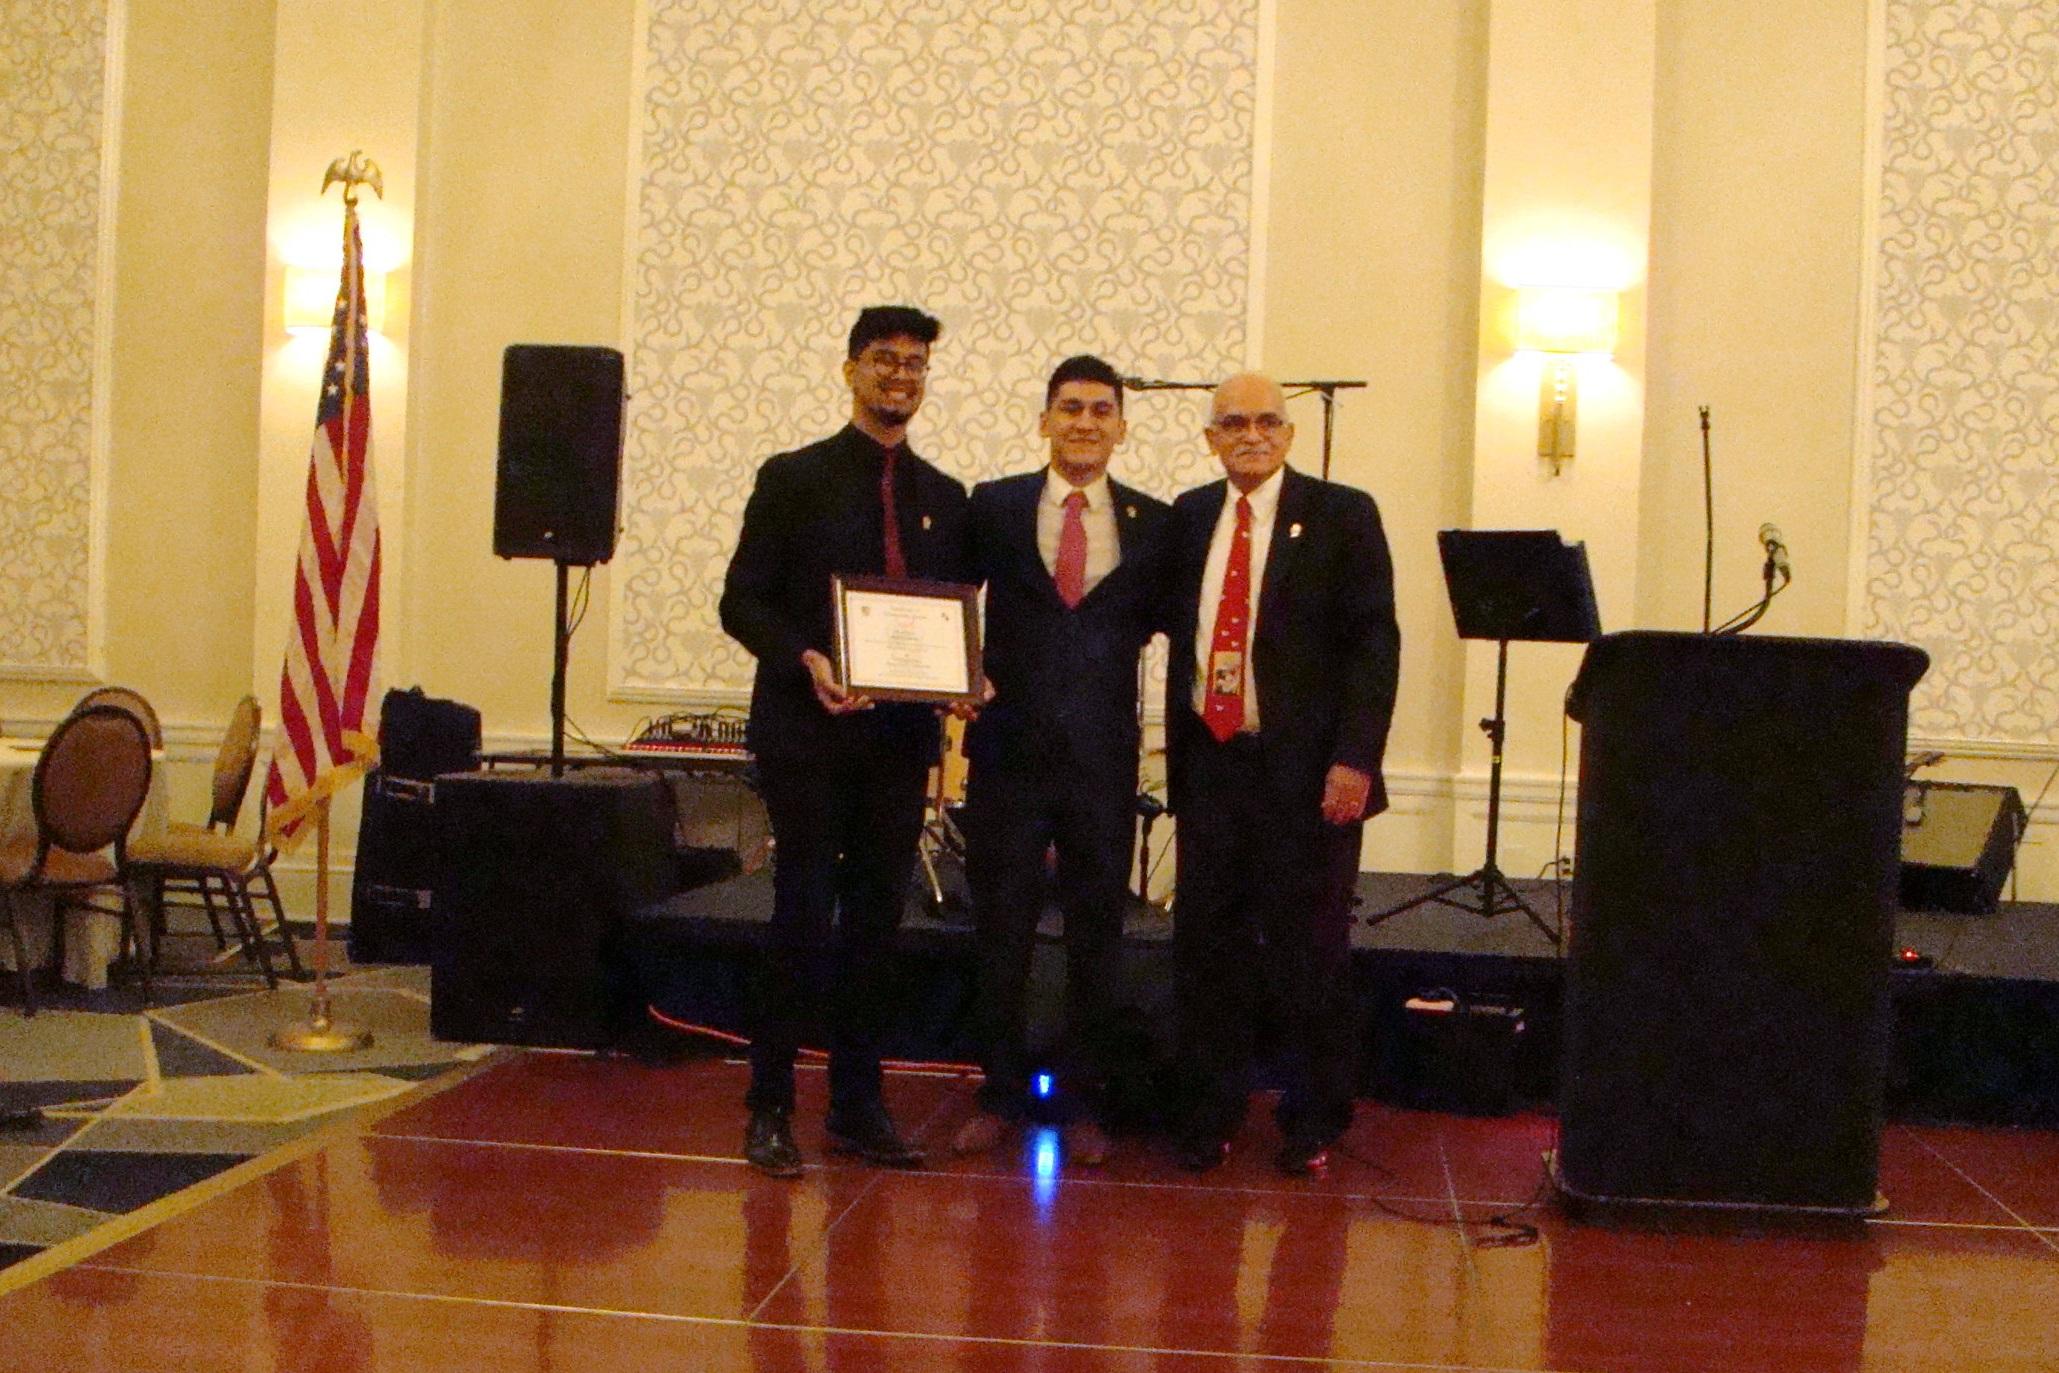 Scholarship Recipient Andy Gutierrez, University of Texas President, Diego Lugo & PKTAAA President, Danny Saenz